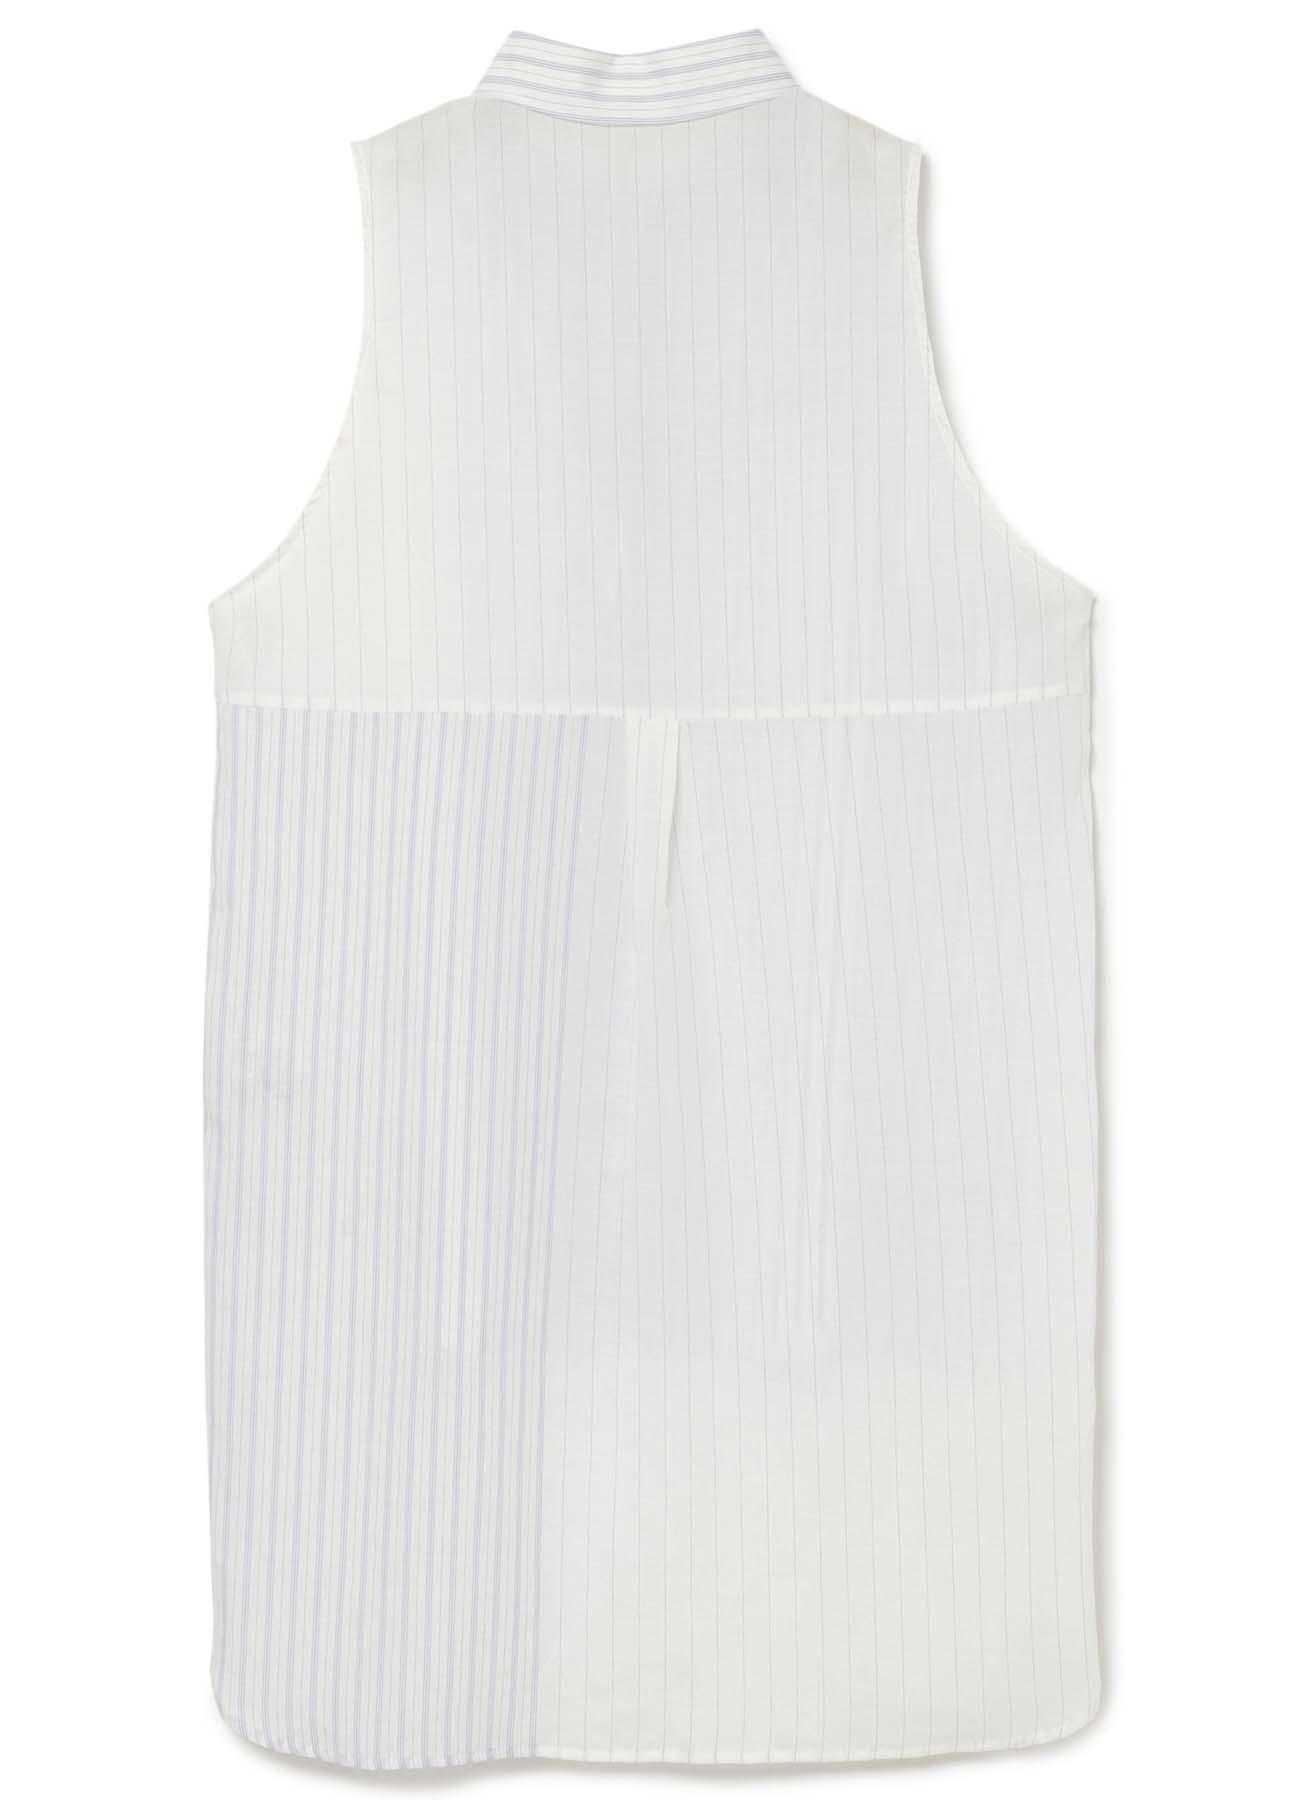 Lexel Lamy Mus条纹无袖衬衫